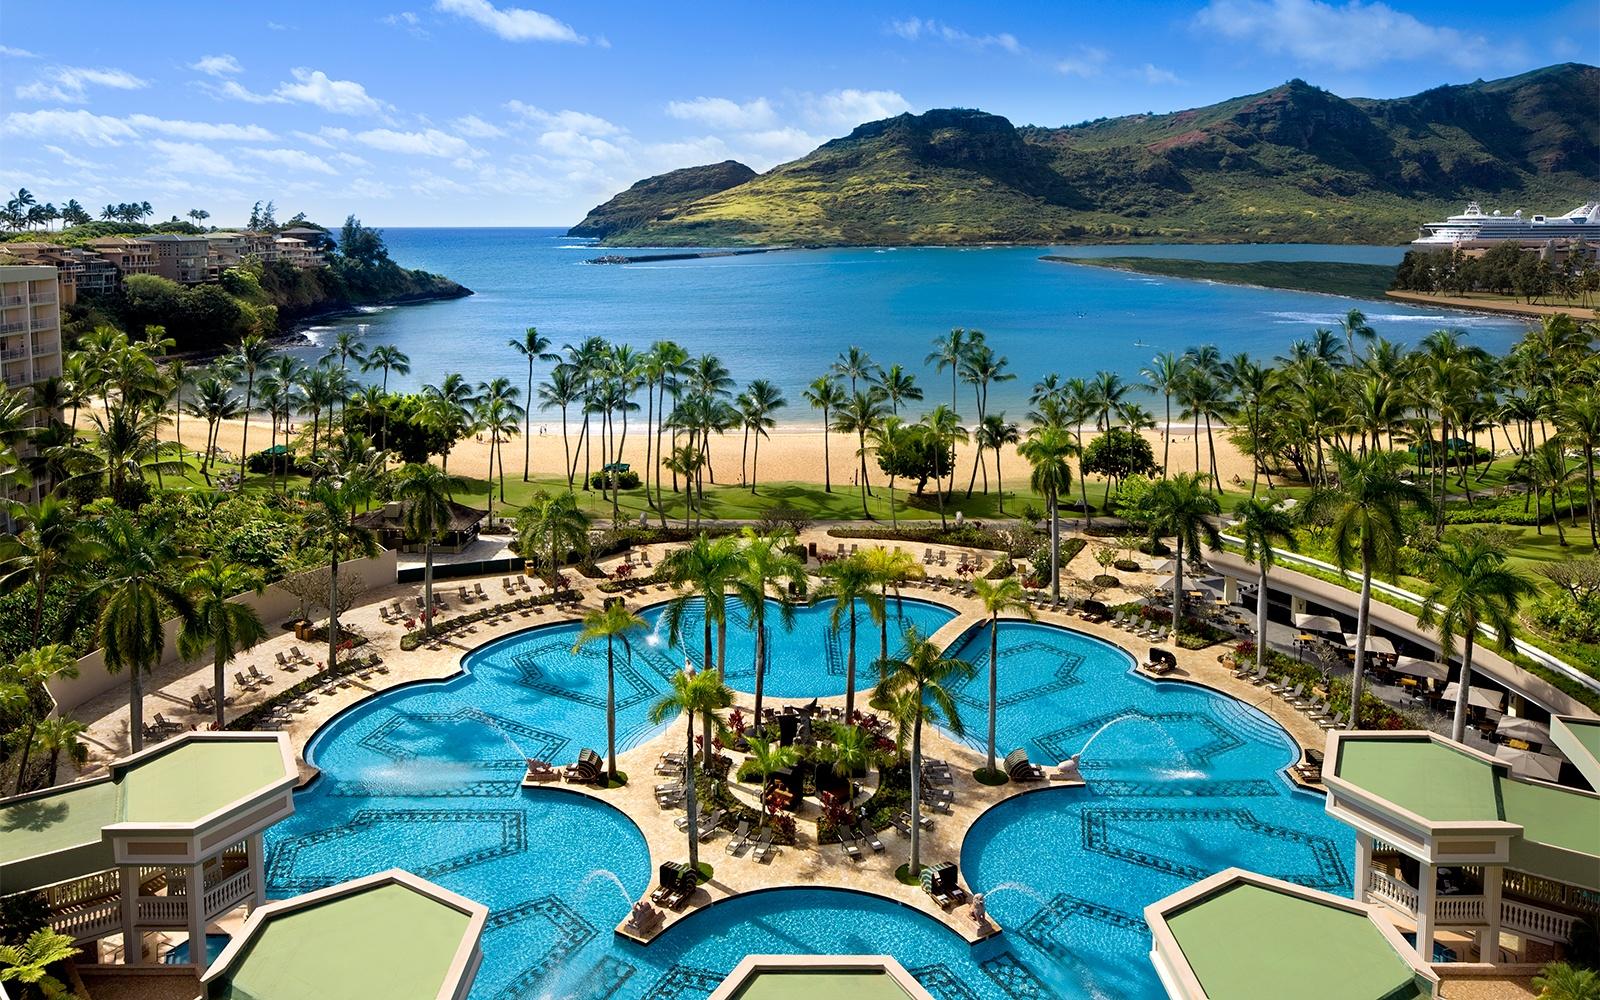 marriott kauai resort